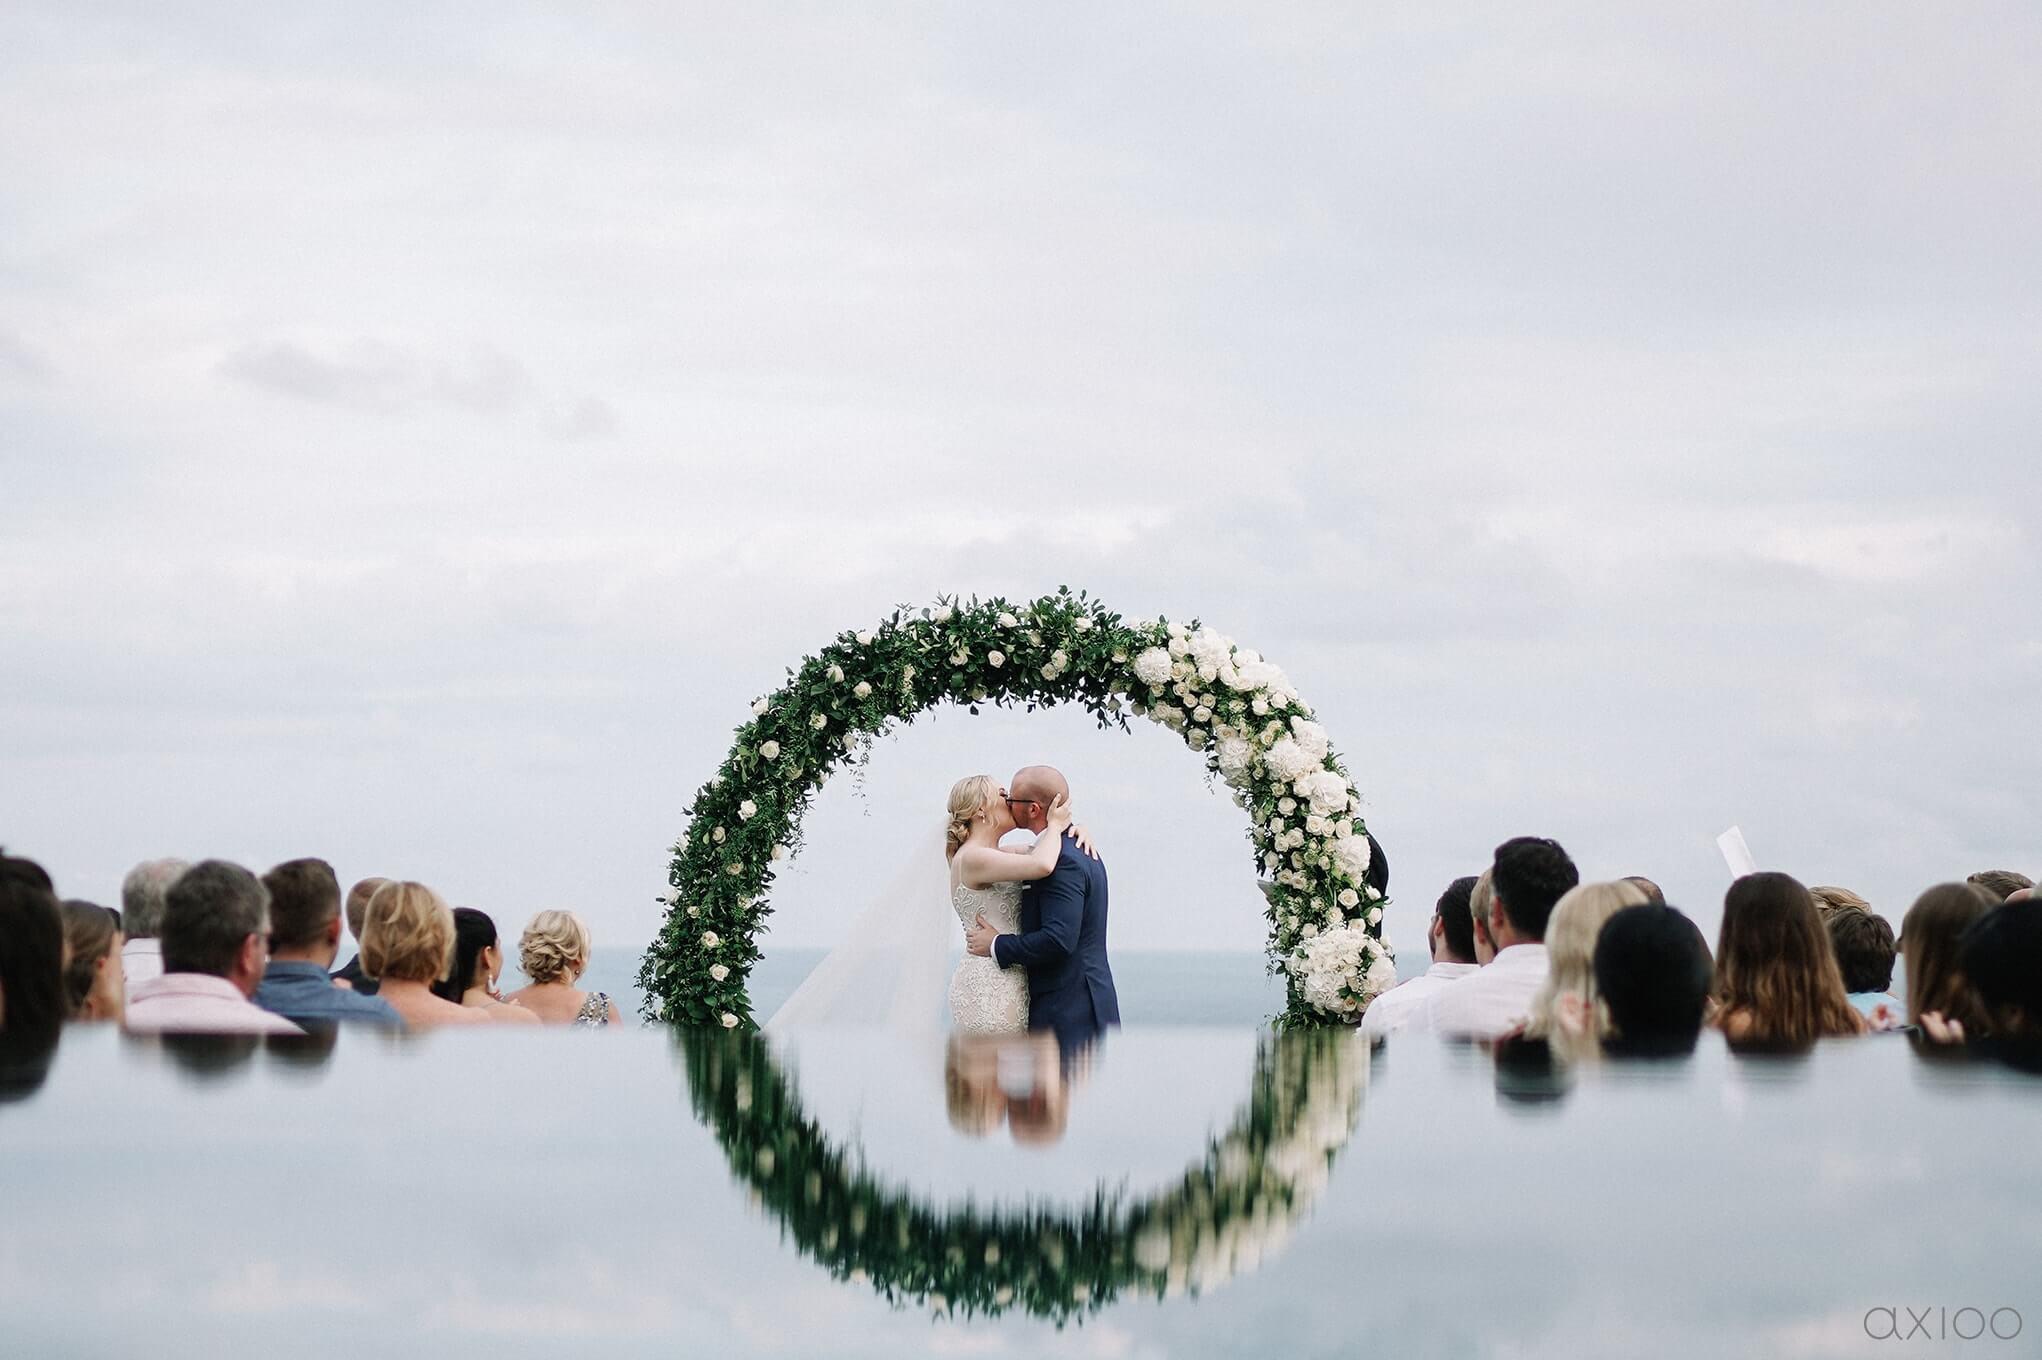 Axioo: Tropical Breeze of Love